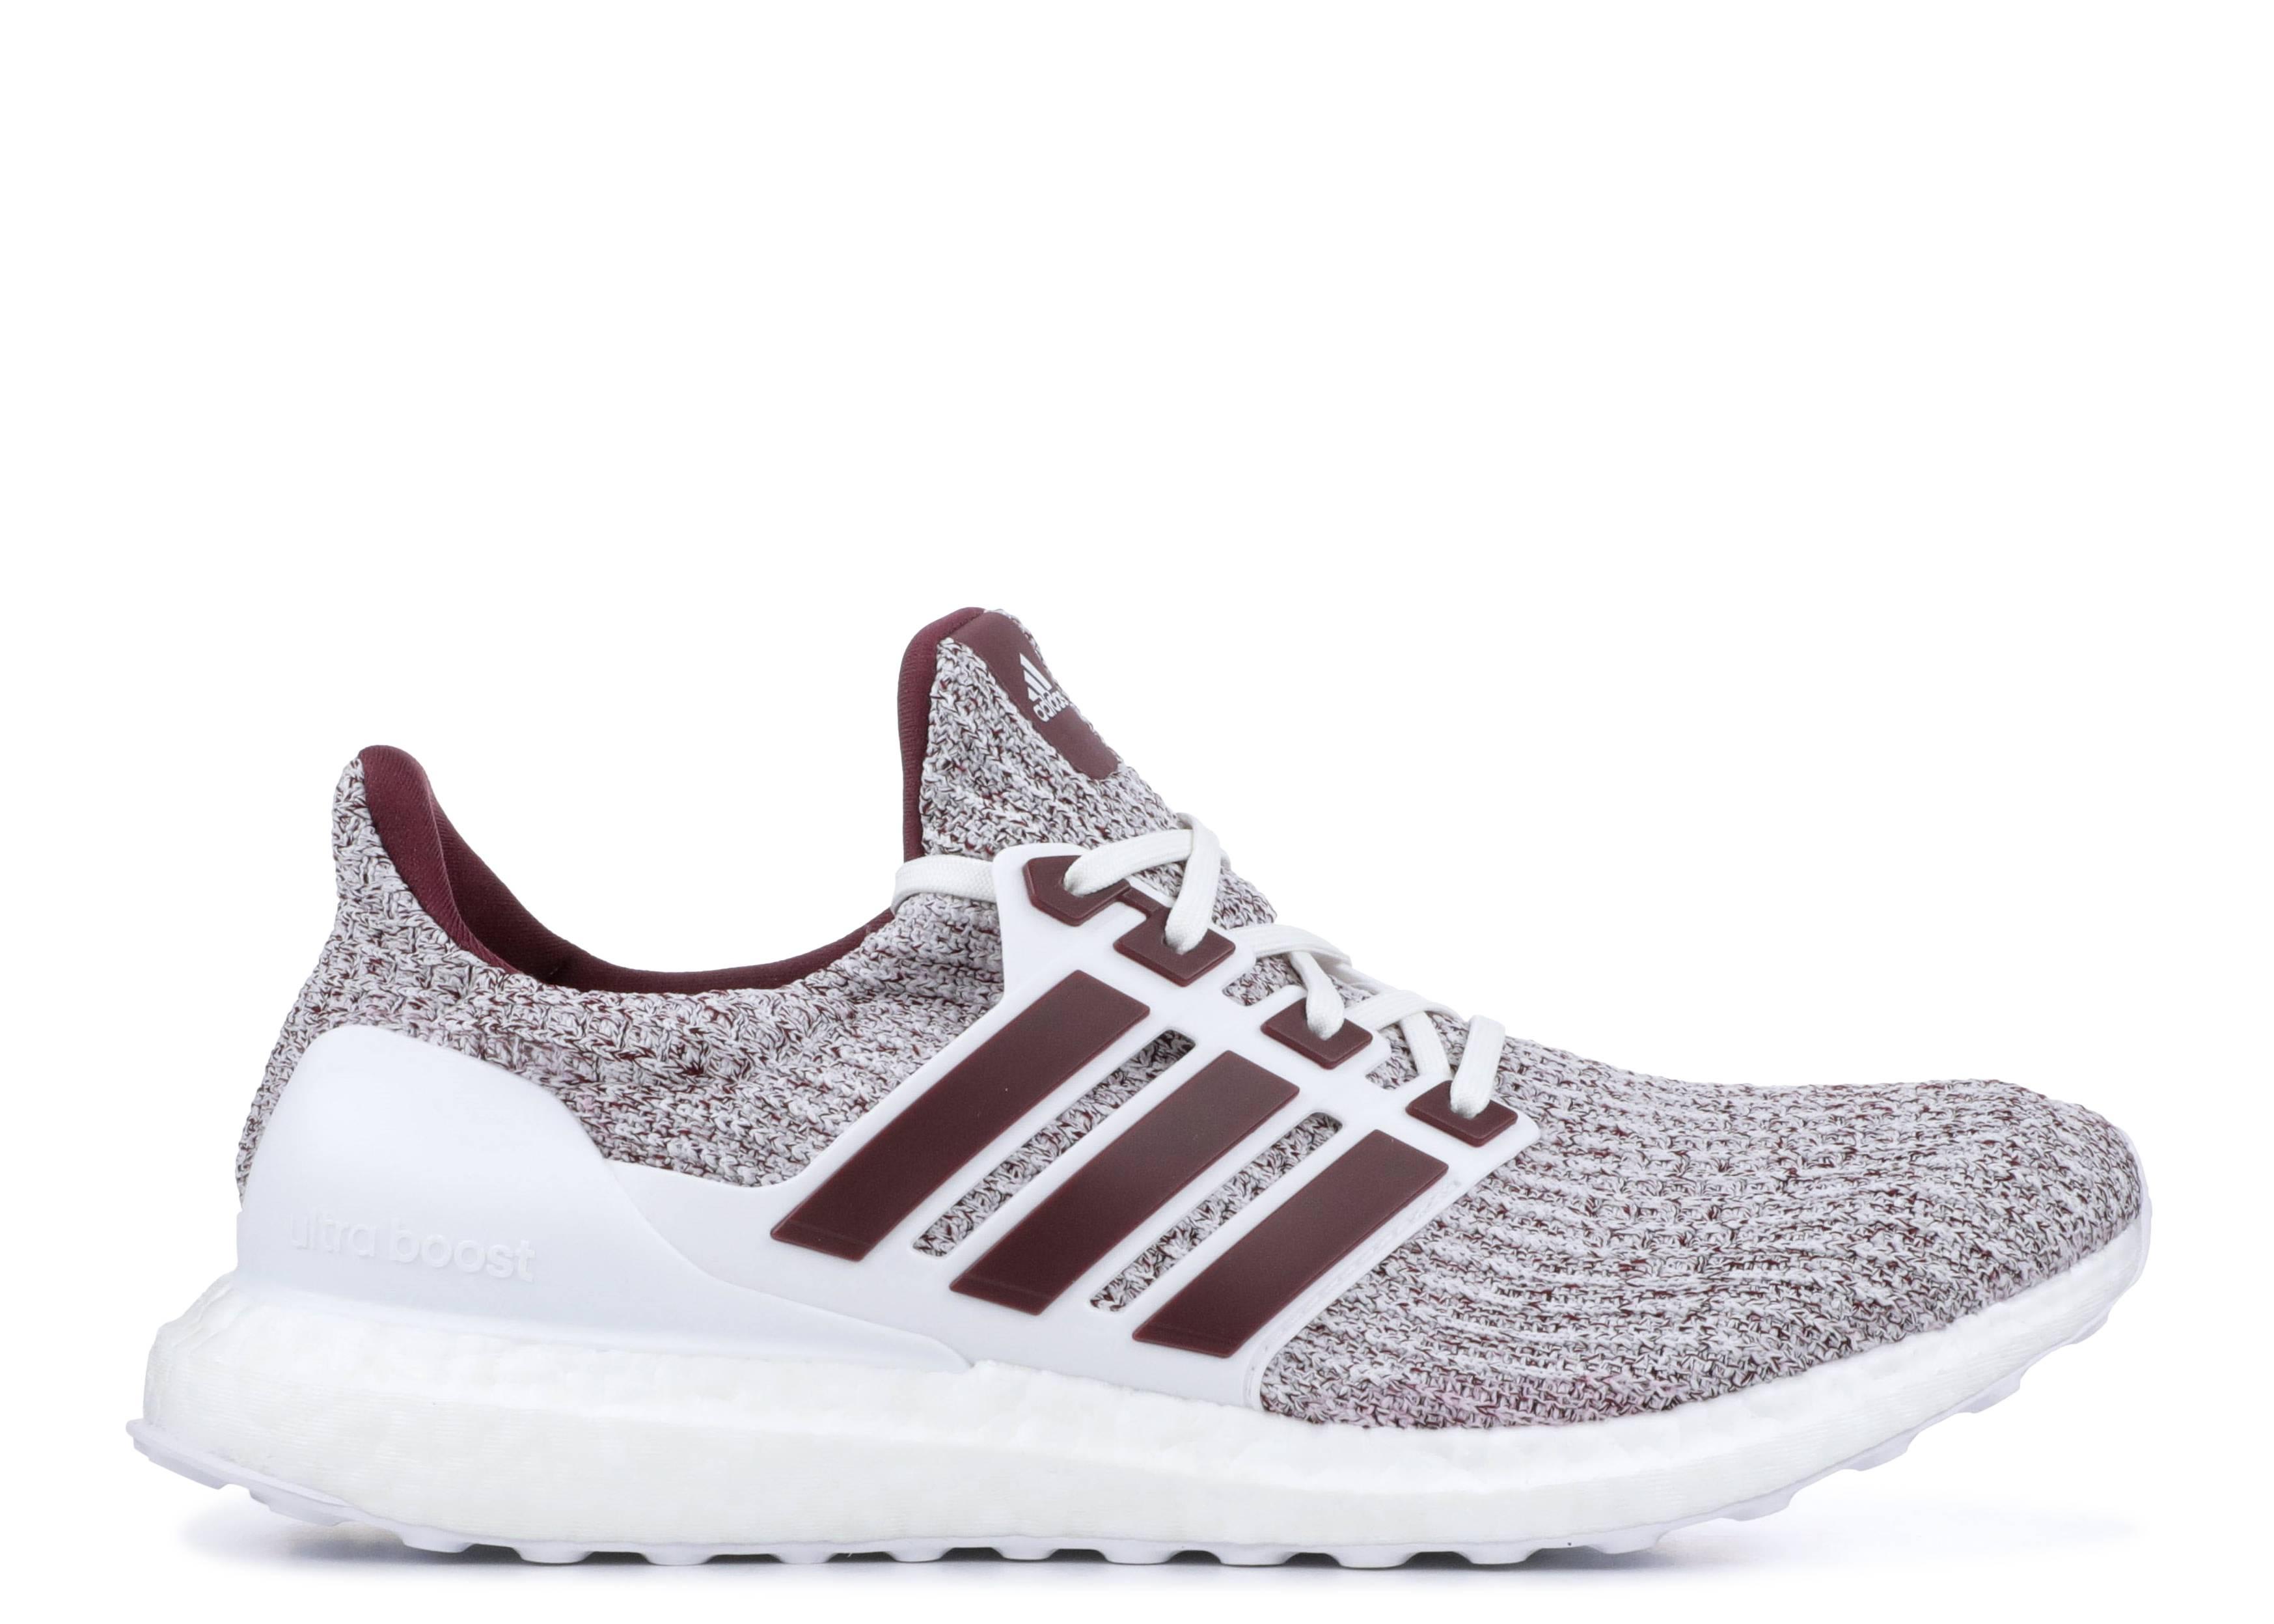 28b60ce00 Ultraboost 4.0 - Adidas - ee3705 - white burgundy